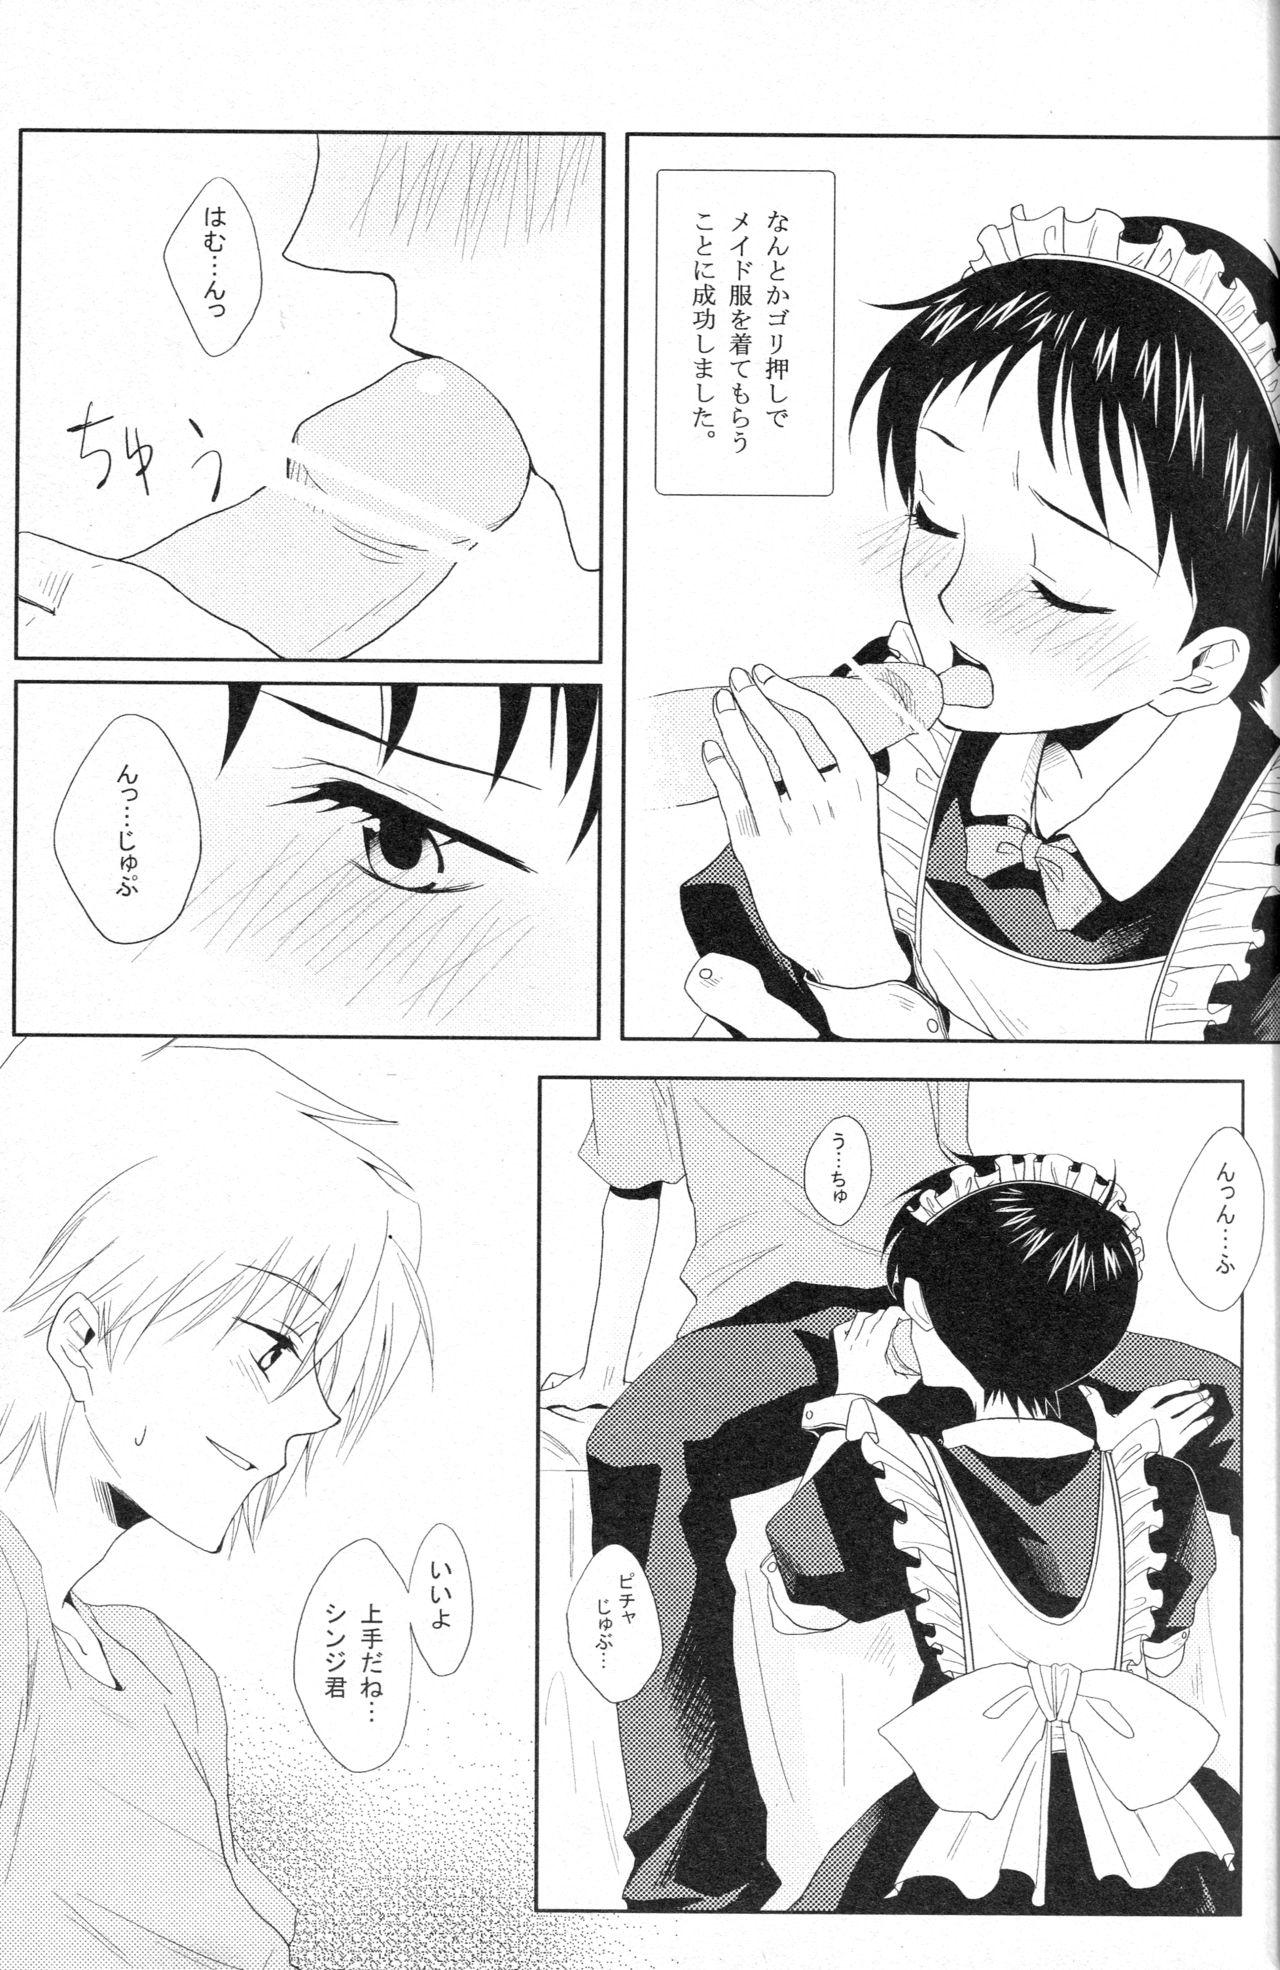 PSP Eva 2 no Susume 27